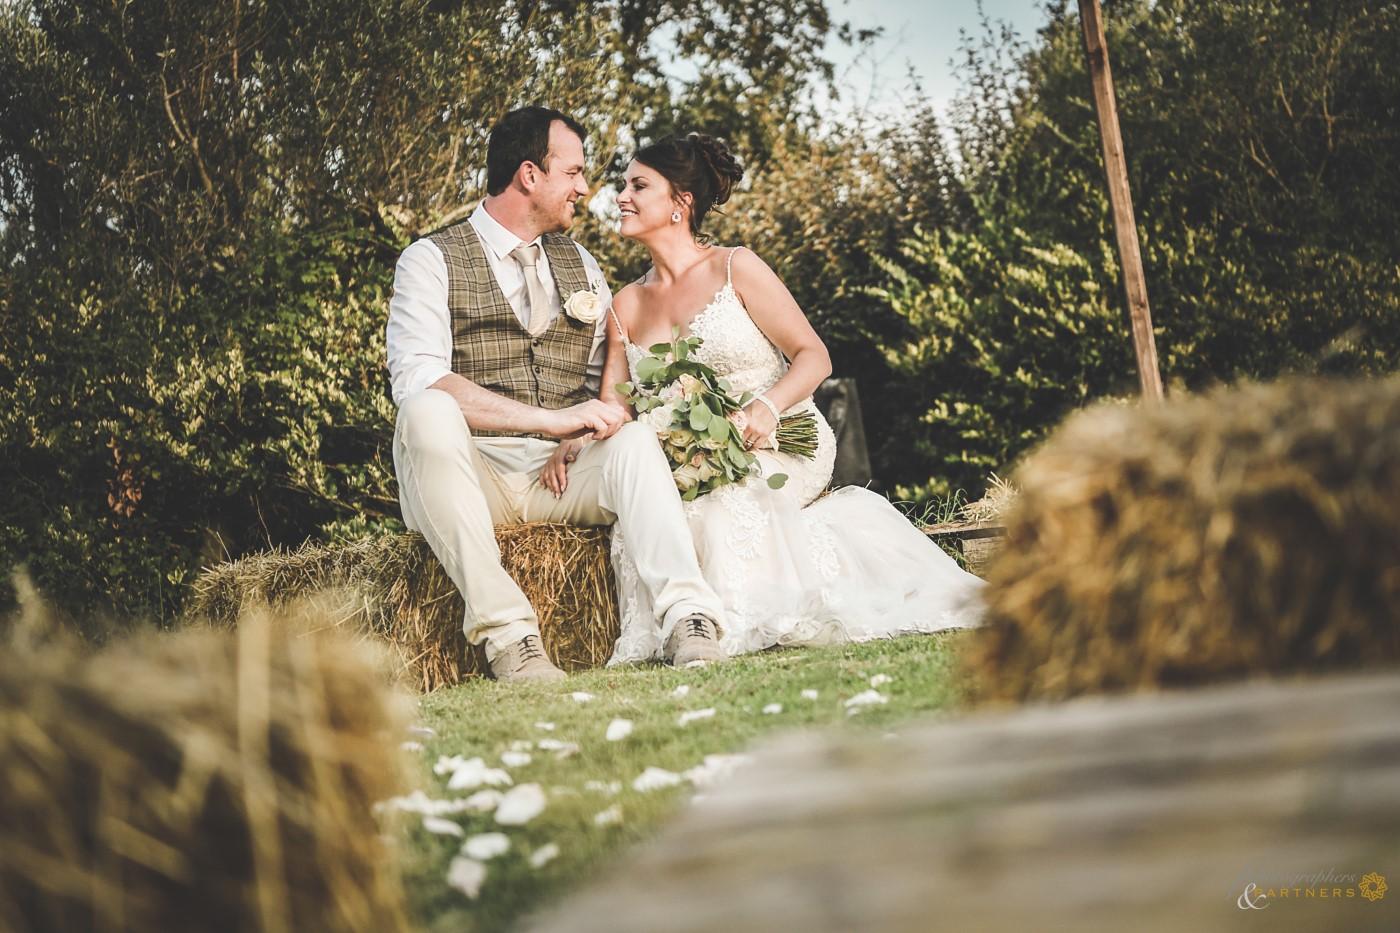 A Romantic Enchanting Italian Wedding In The Umbrian: Romantic Italian Wedding Photographer Umbria